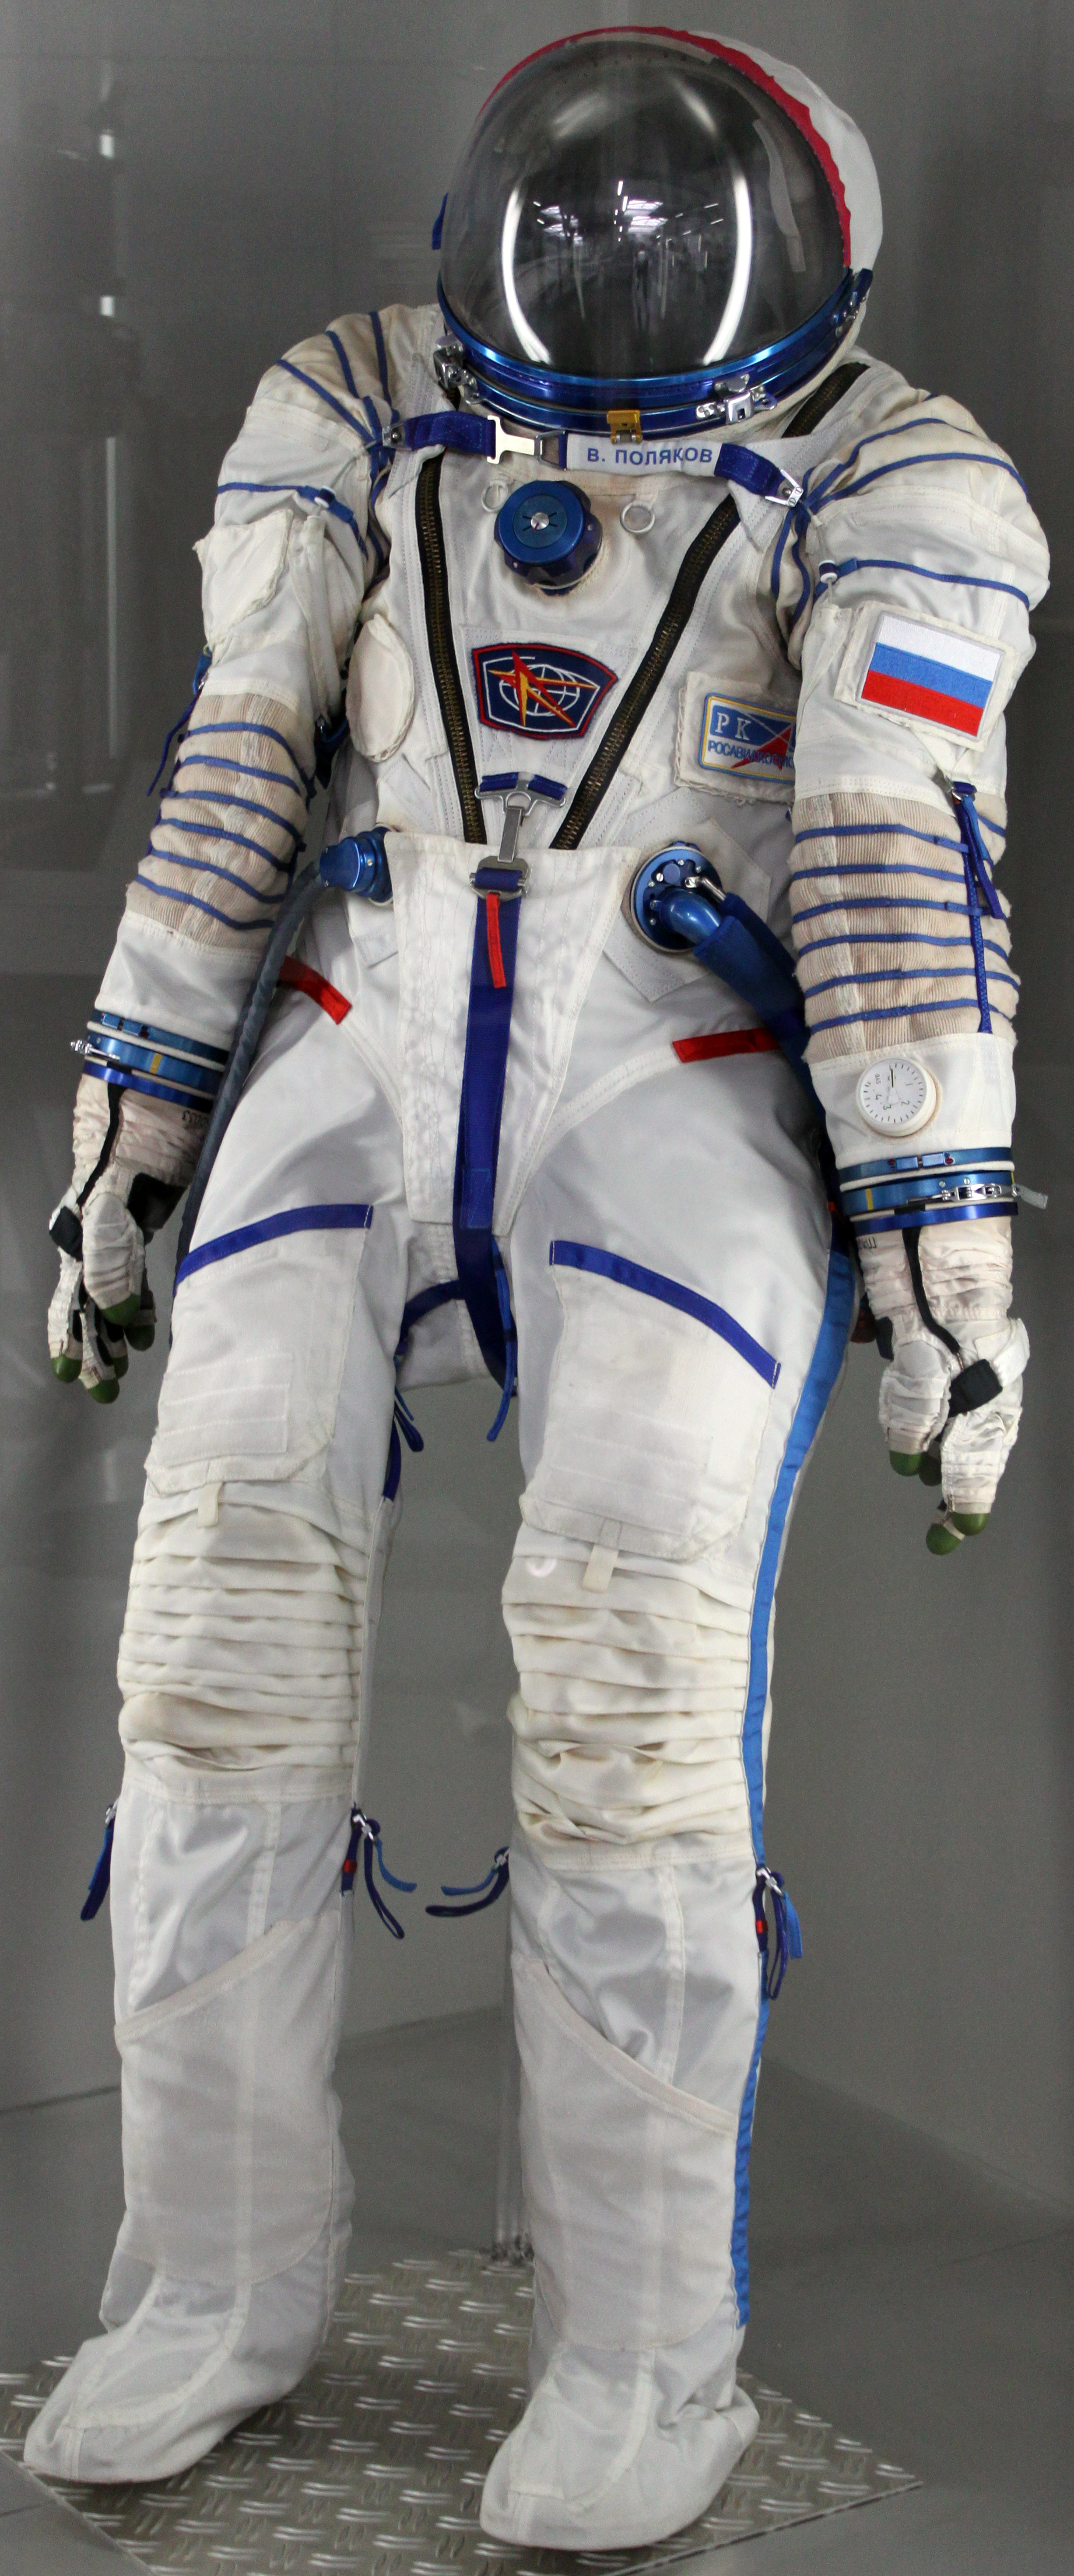 File2012 10 23 Sokol KV 2 Space Suit AnagoriaJPG